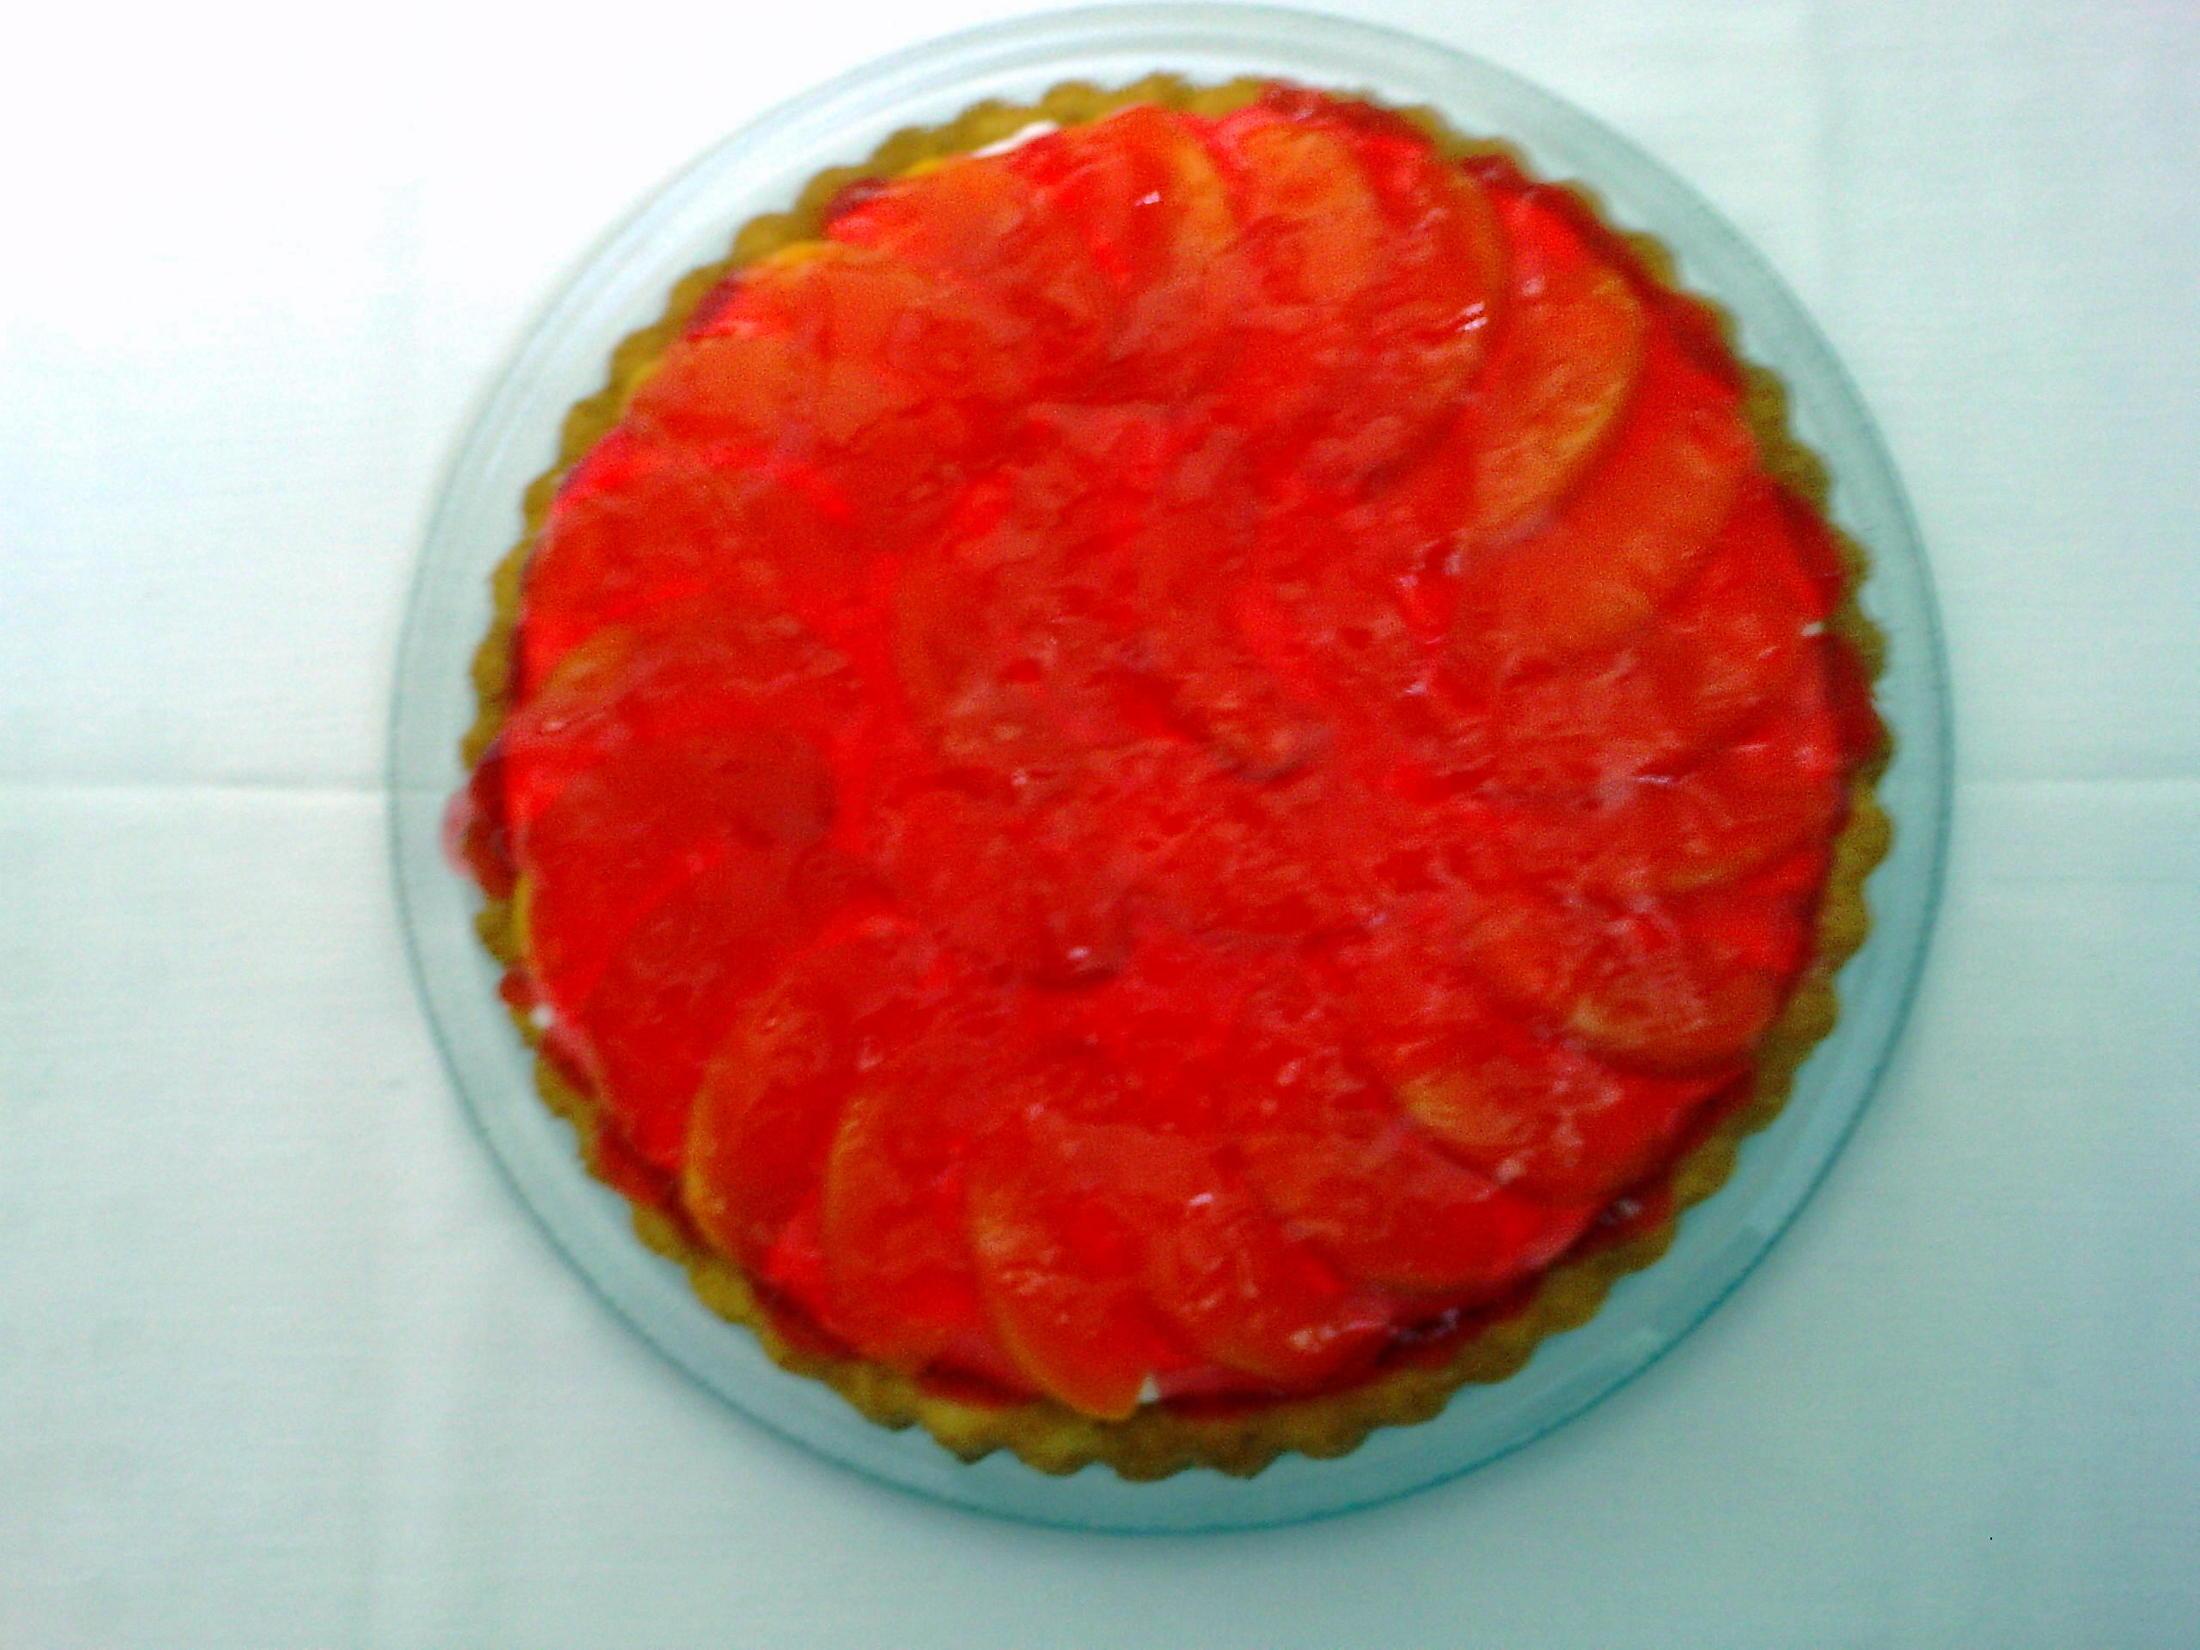 Ovocný dezert s korpusem